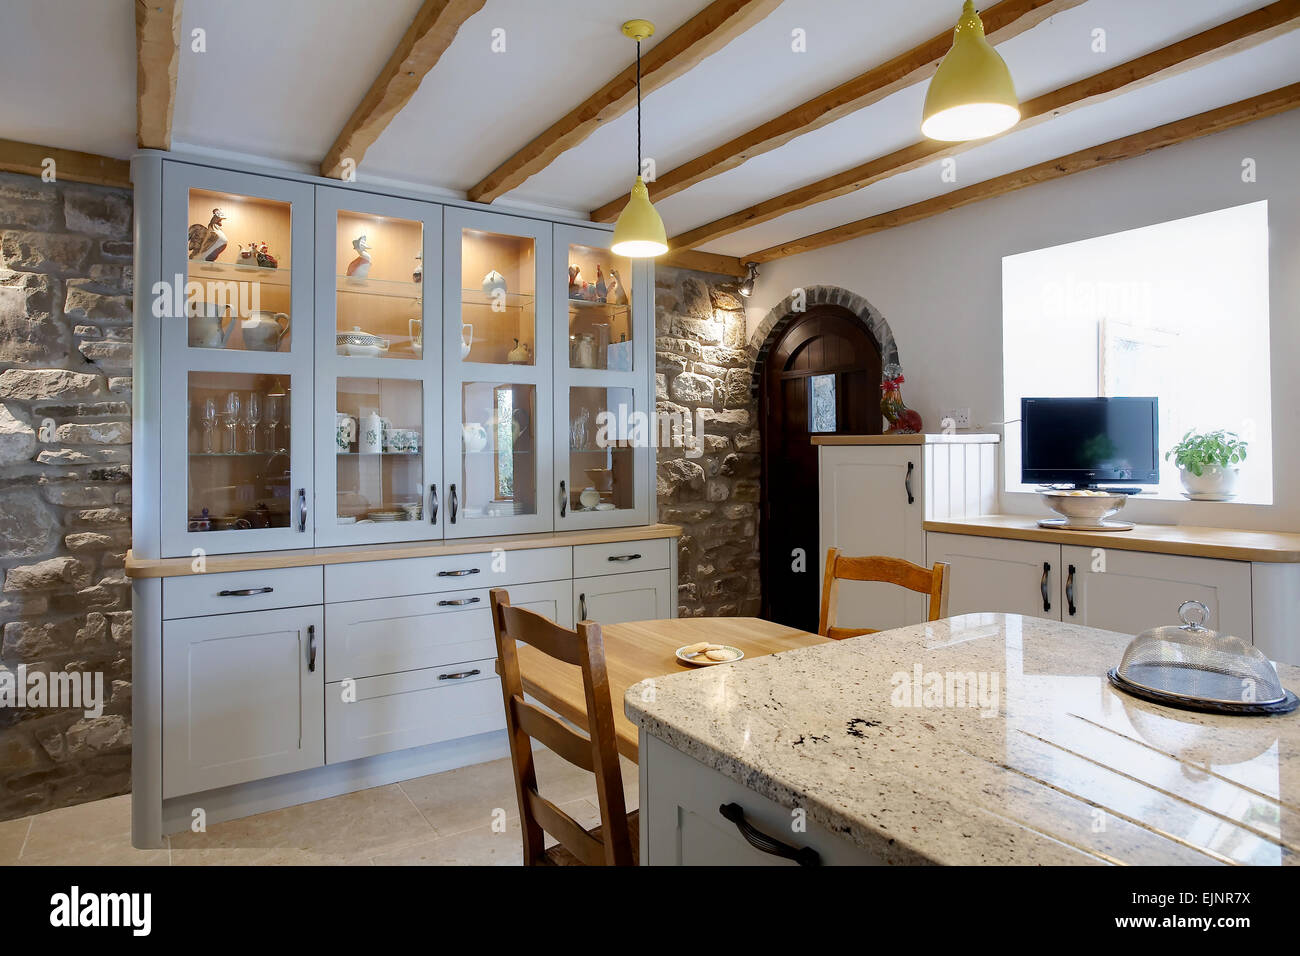 Modern Farmhouse Stockfotos & Modern Farmhouse Bilder - Alamy